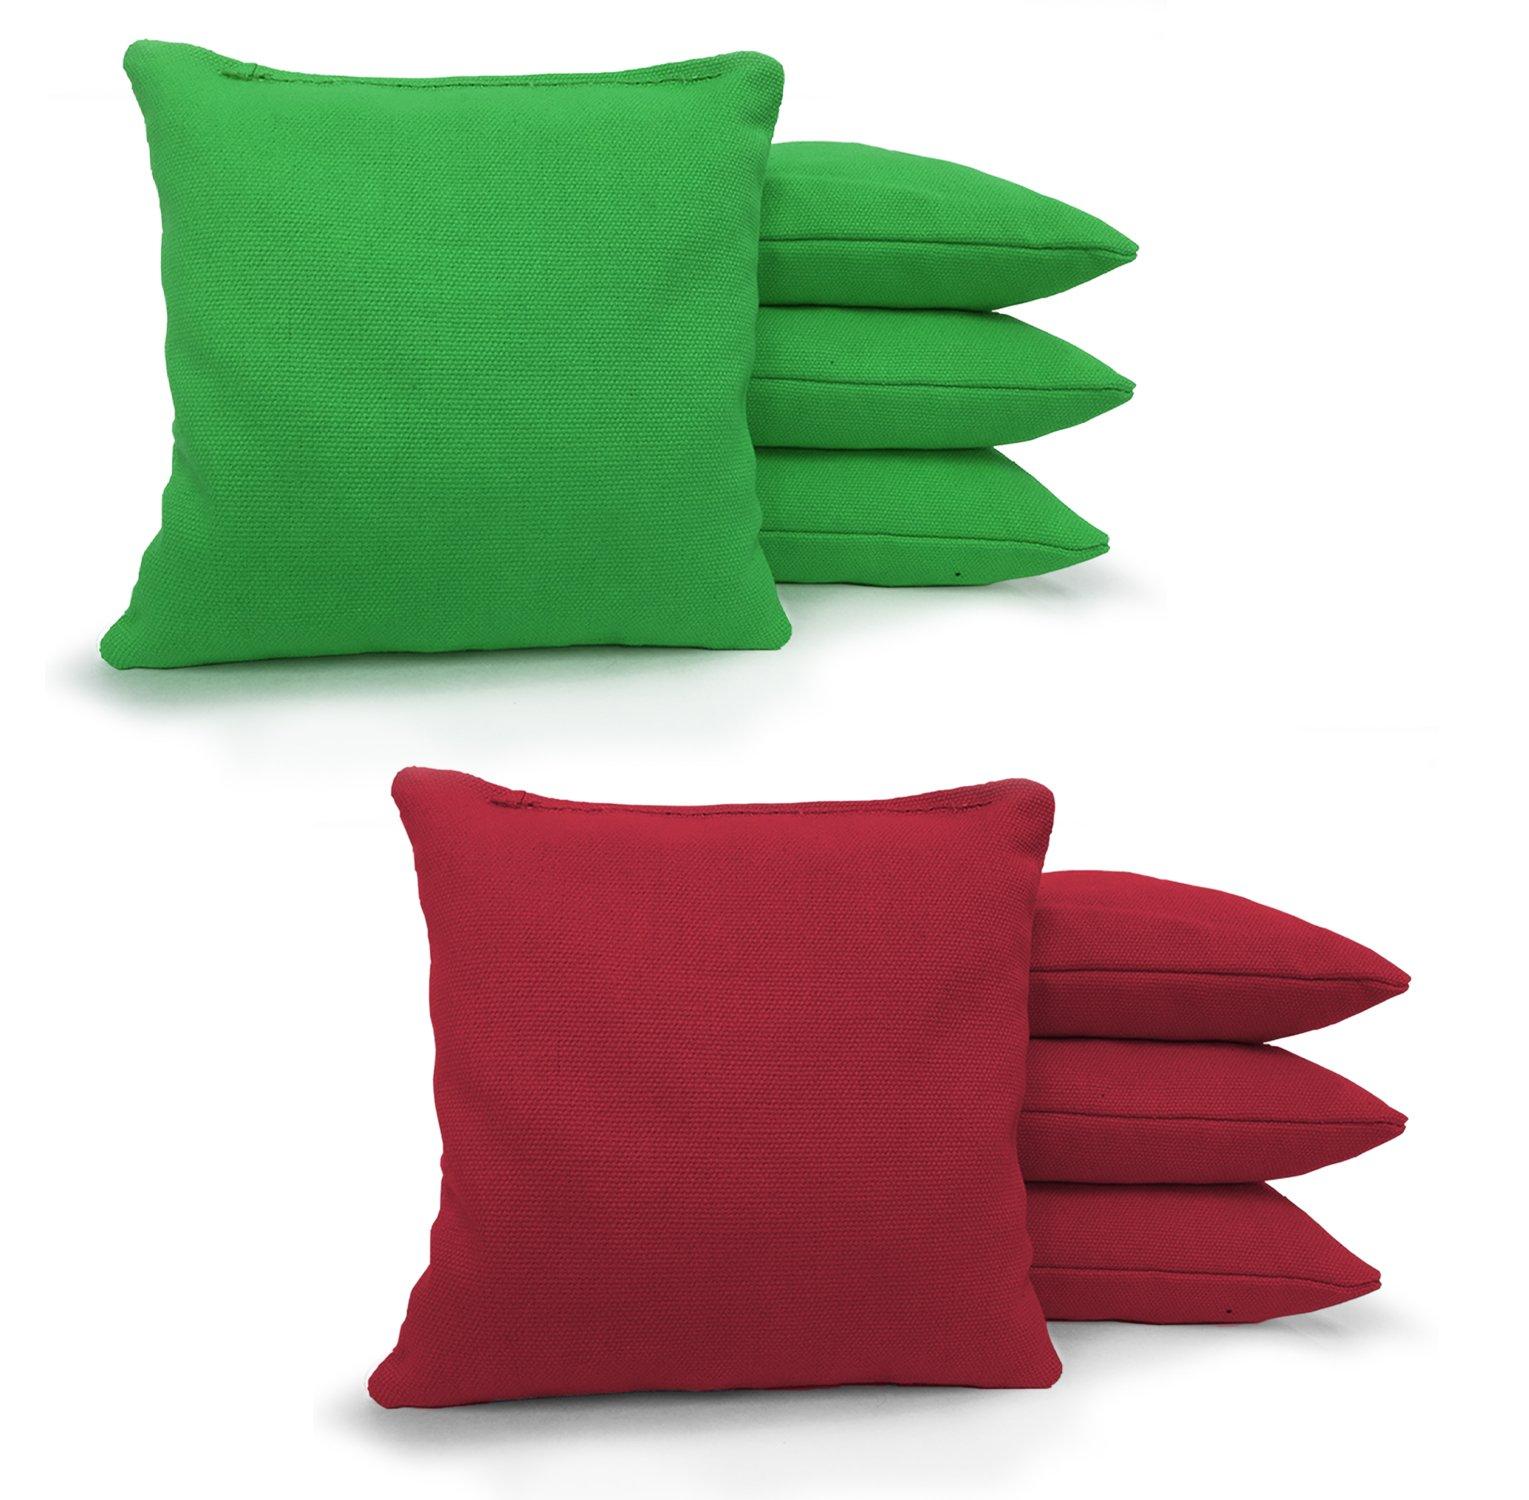 Johnson Enterprises, LLC 8 Standard Corn Filled Regulation Duck Cloth Cornhole Bags 17 Colors Available (You Pick)!! (Kelly/Scarlet) by Johnson Enterprises, LLC